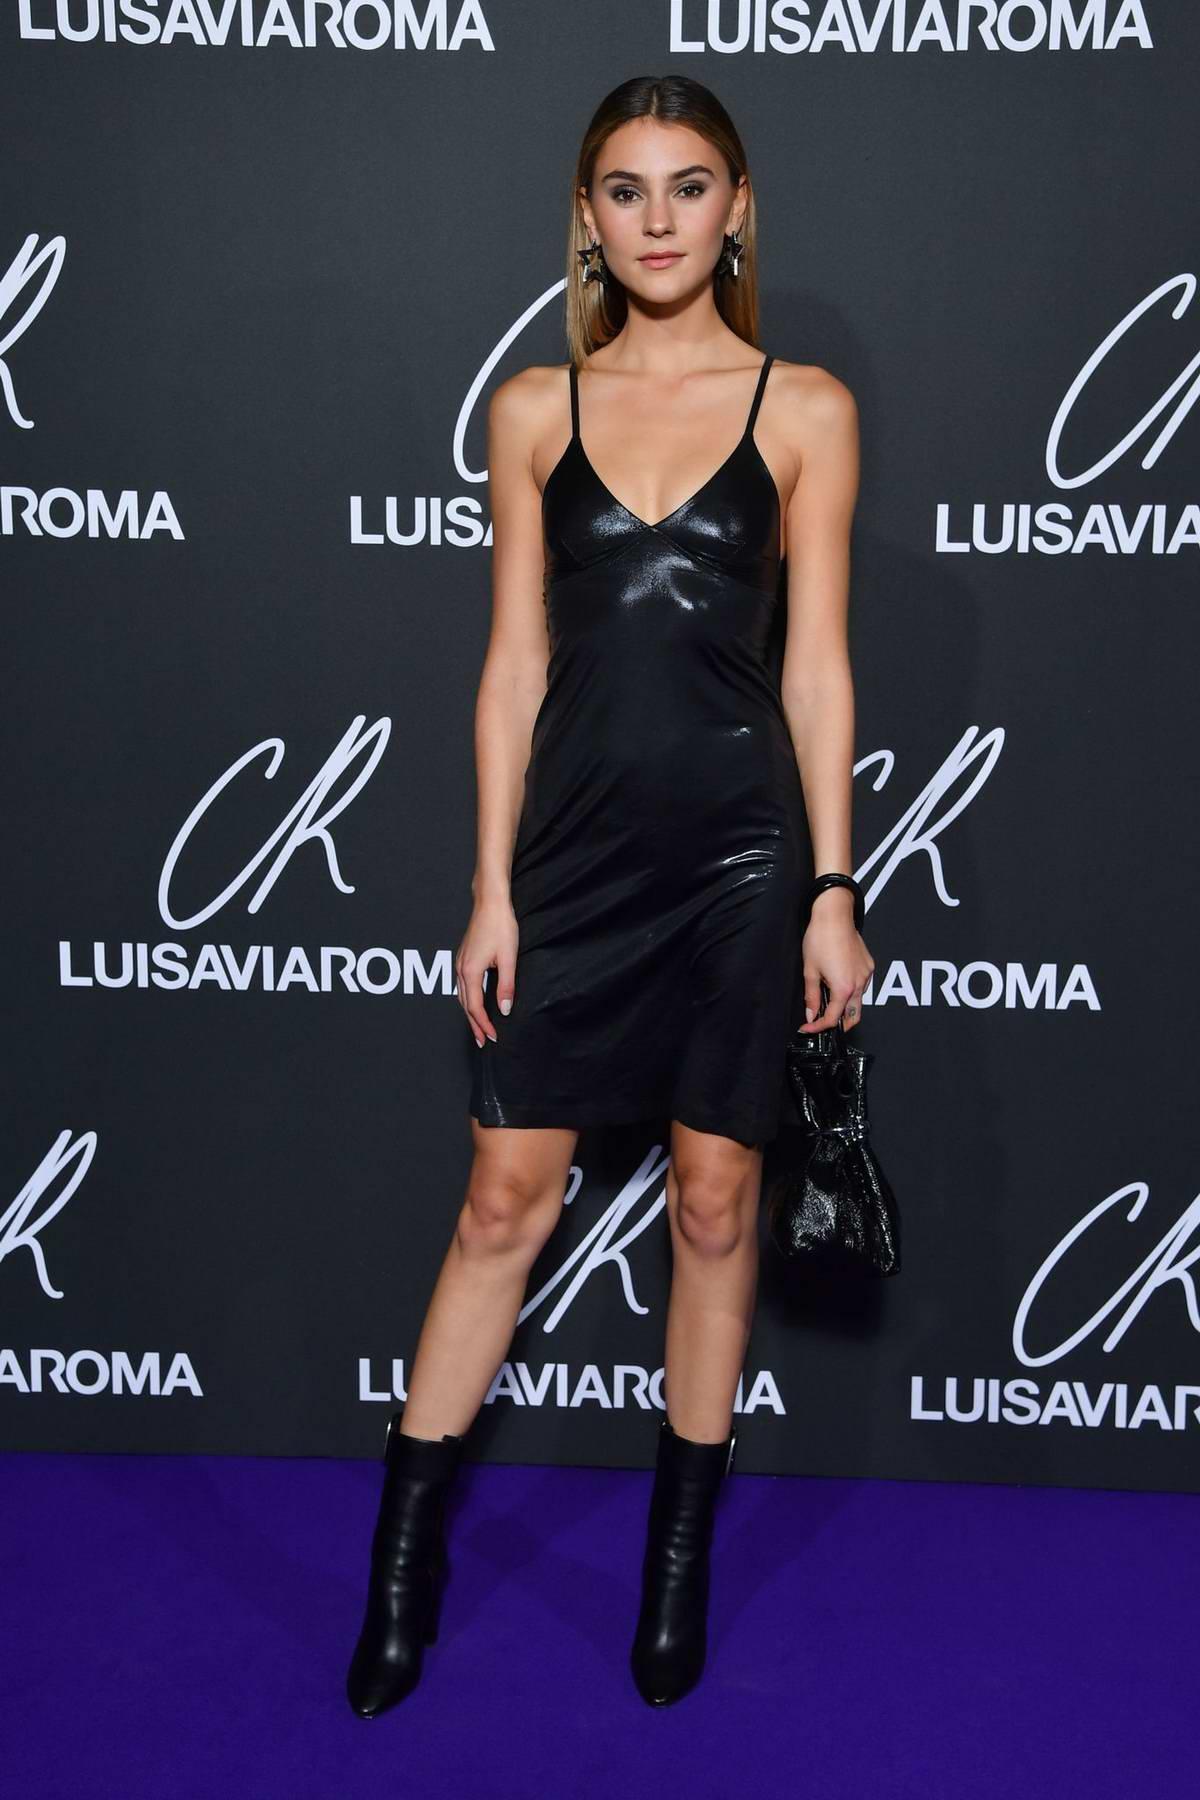 Stefanie Giesinger attends the CR Fashion Book x Luisasaviaroma photocall during Paris Fashion Week in Paris, France